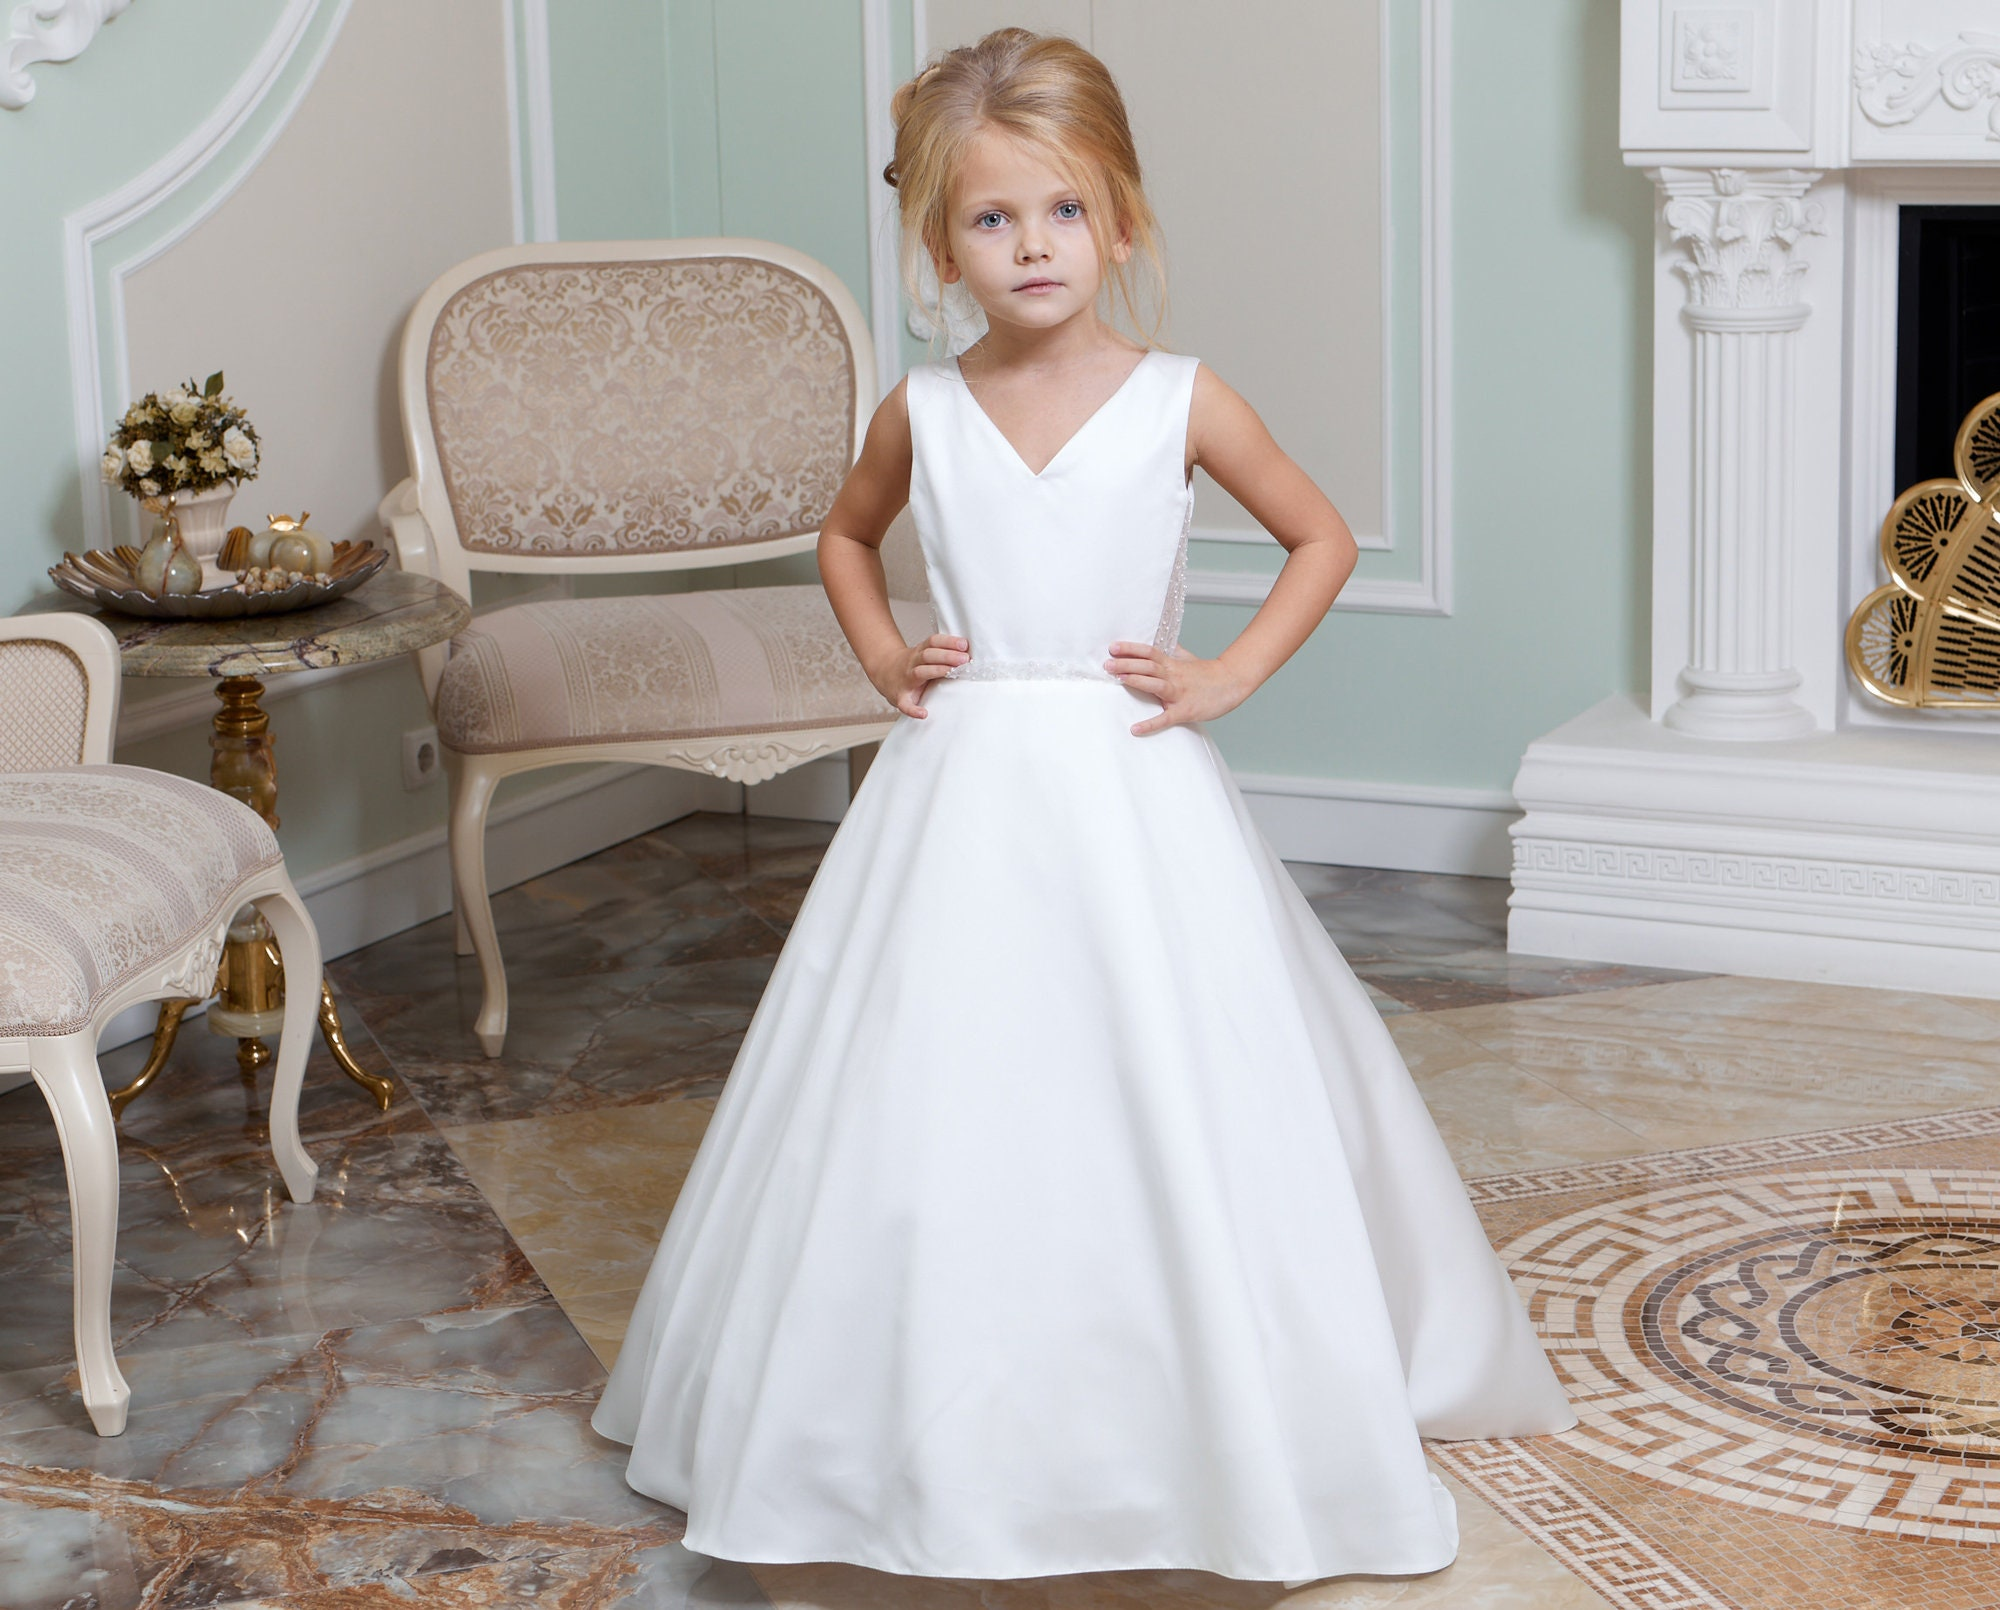 Miama Champagne Lace Tulle Wedding Flower Girl Dress Junior Bridesmaid Dress